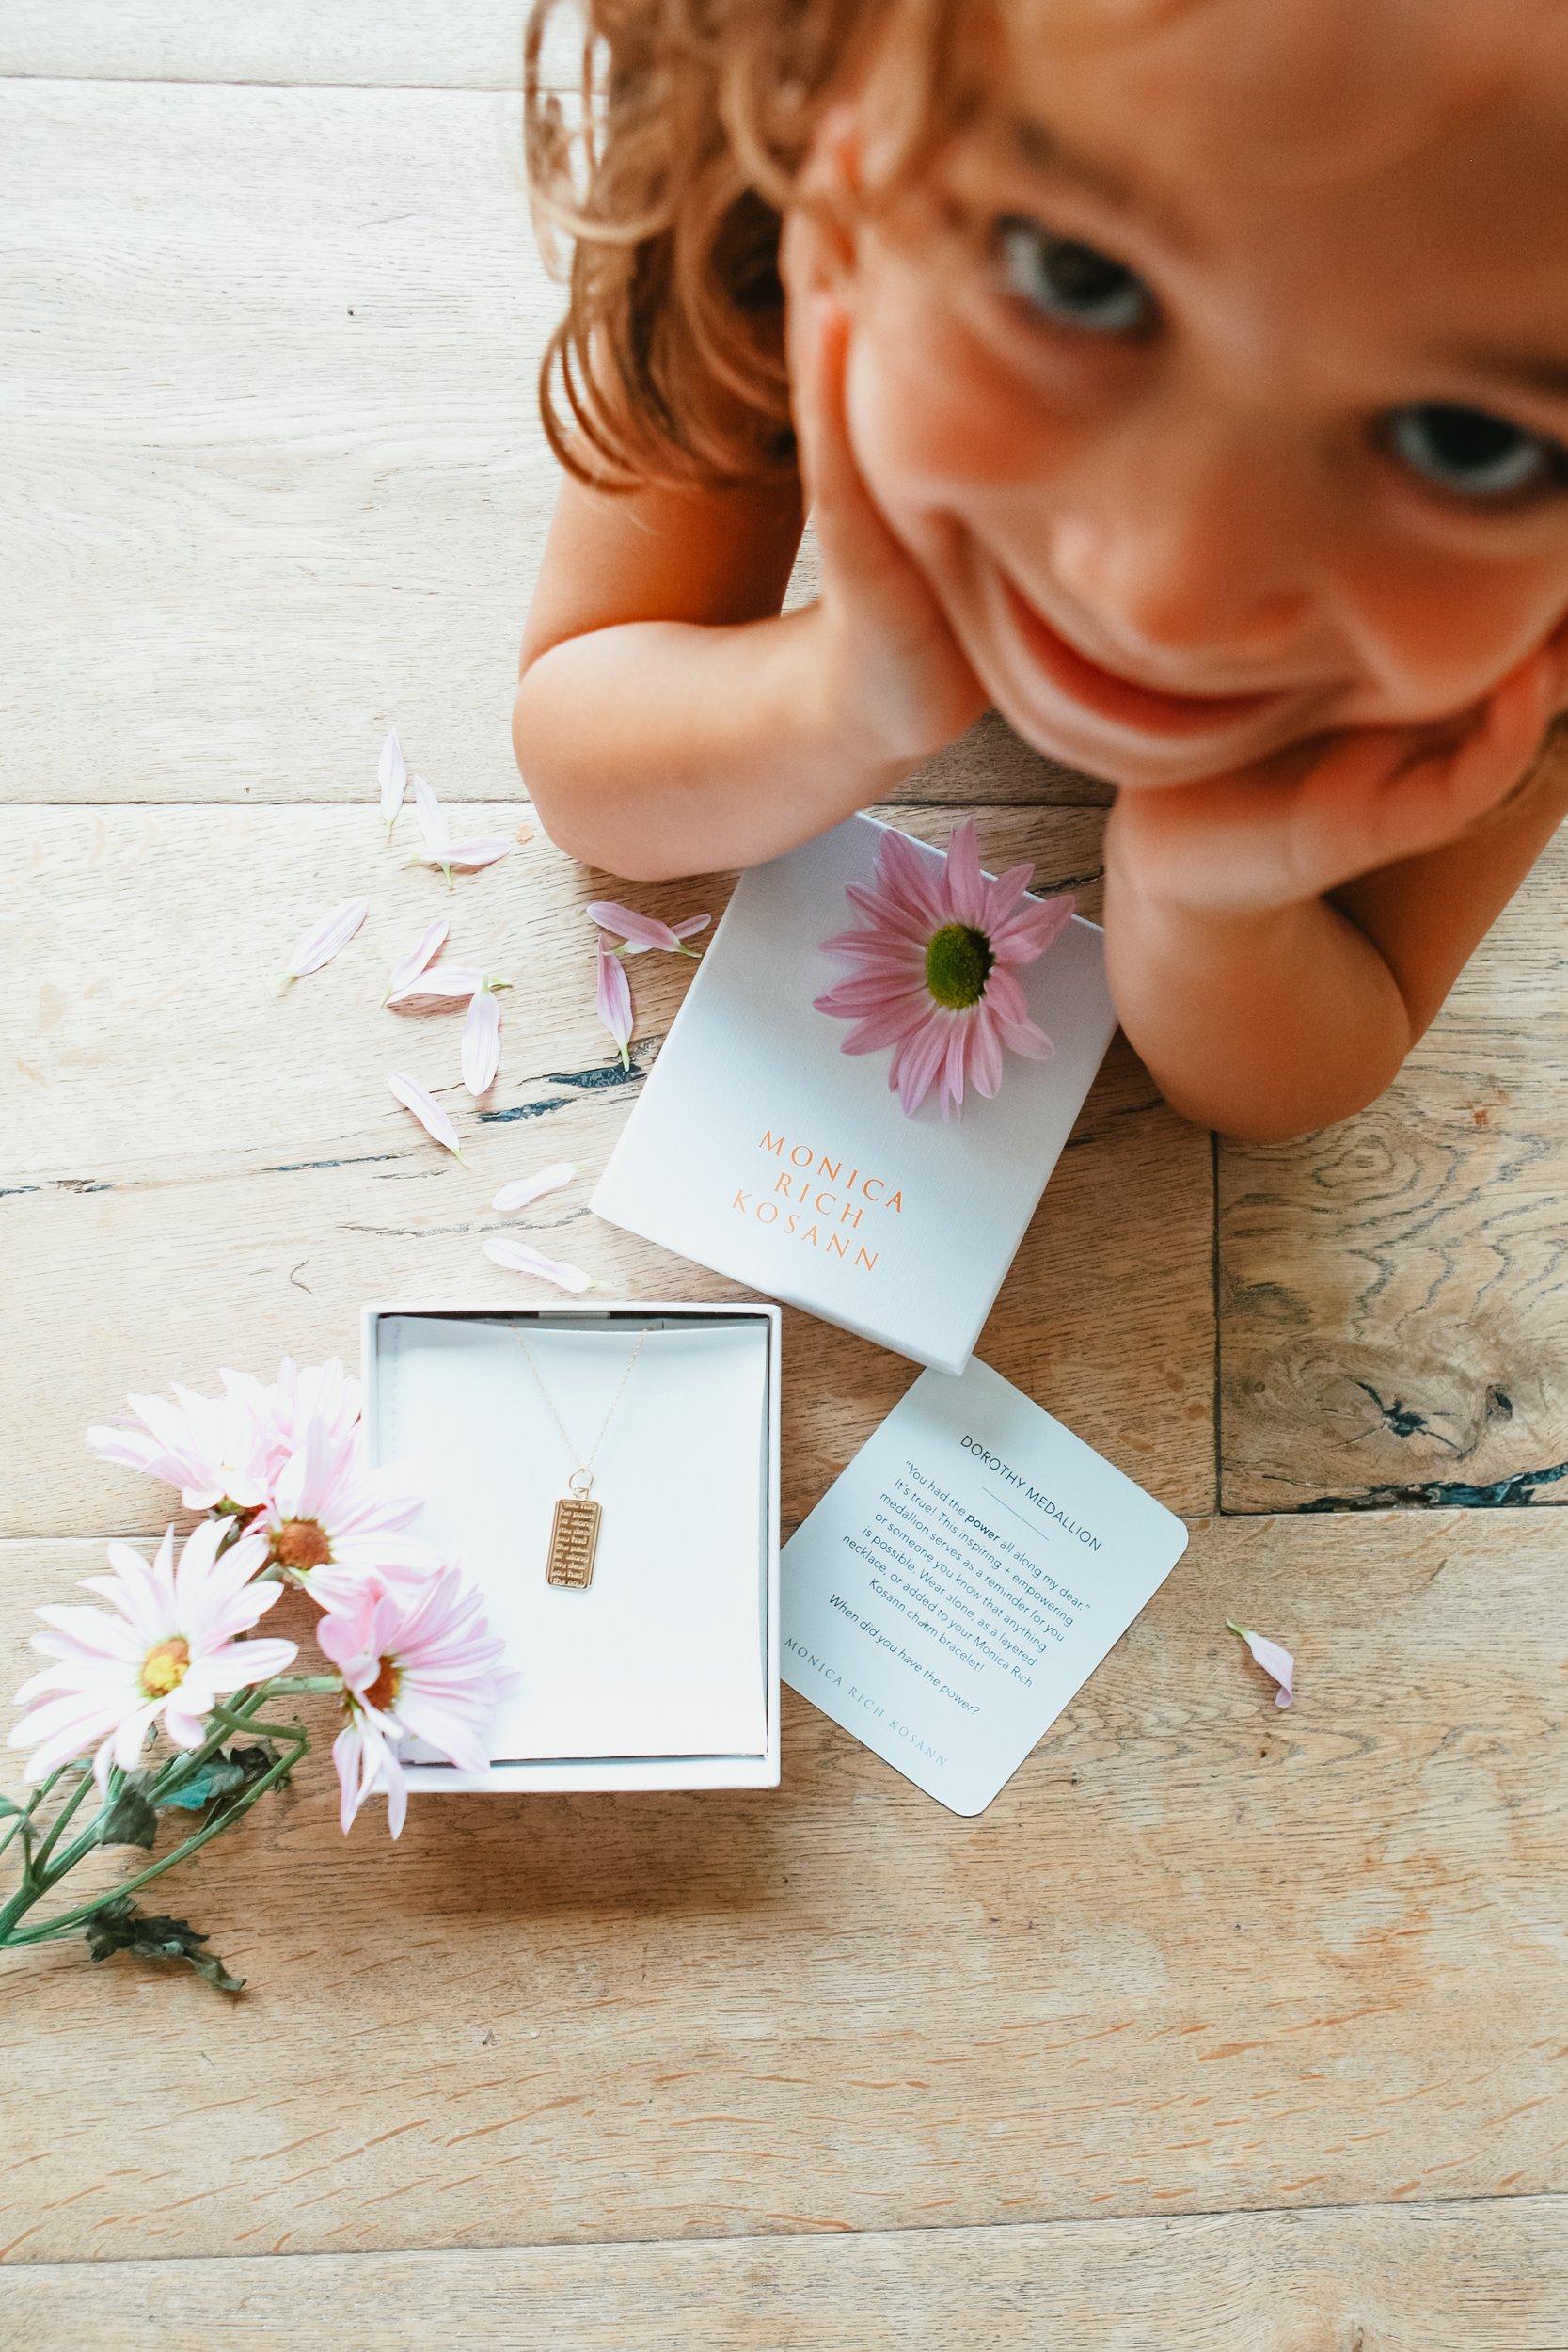 child with jewelry giftbox